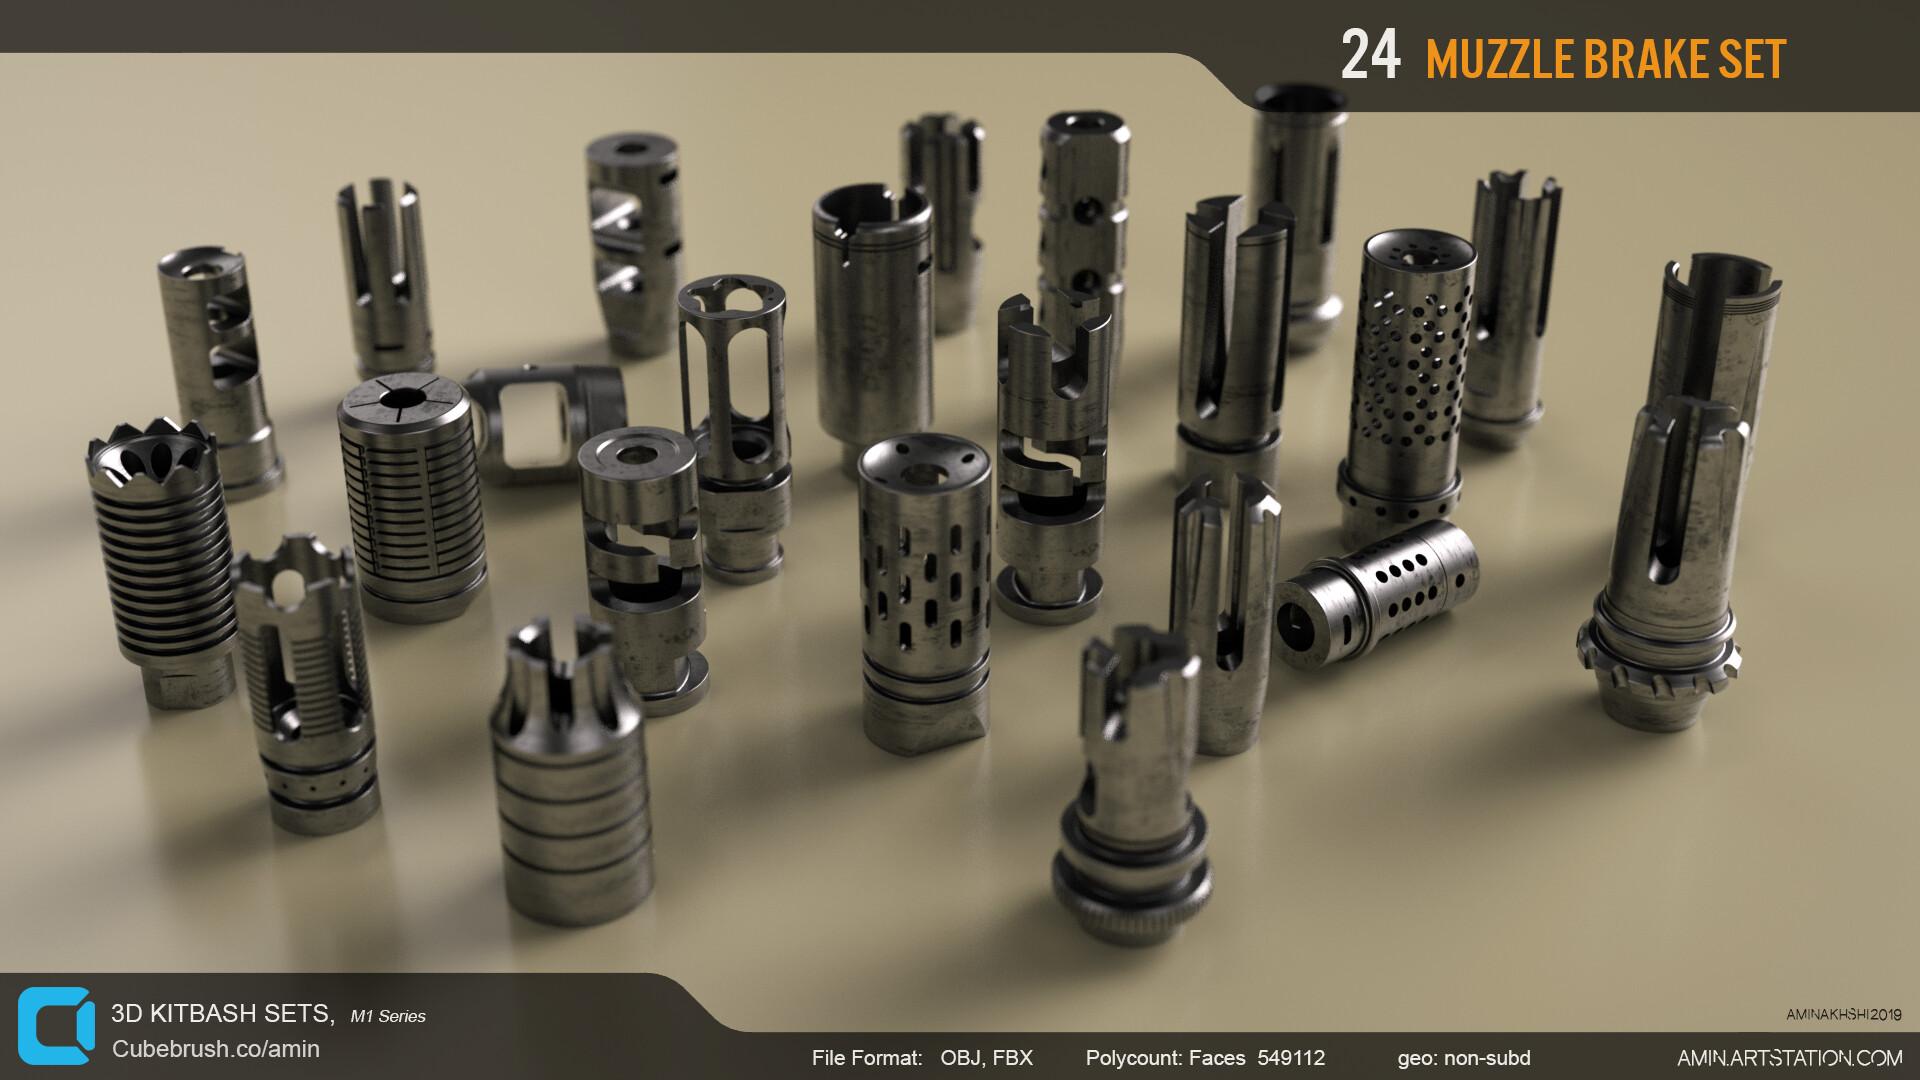 Amin akhshi 007 muzzle brakes set